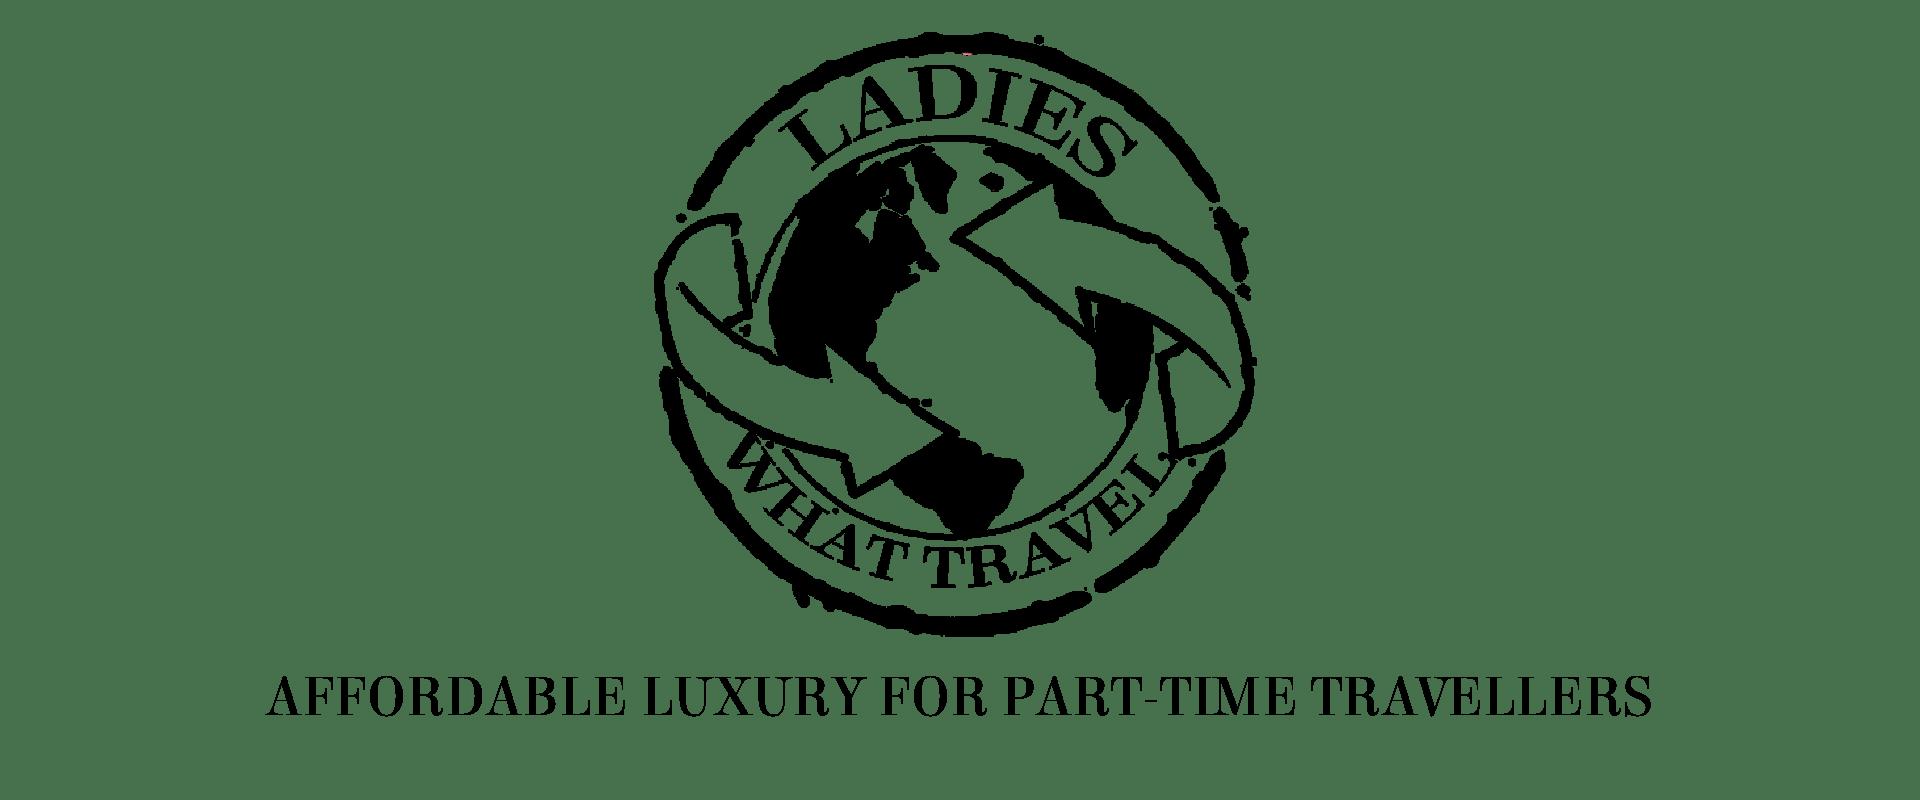 ladies what travel